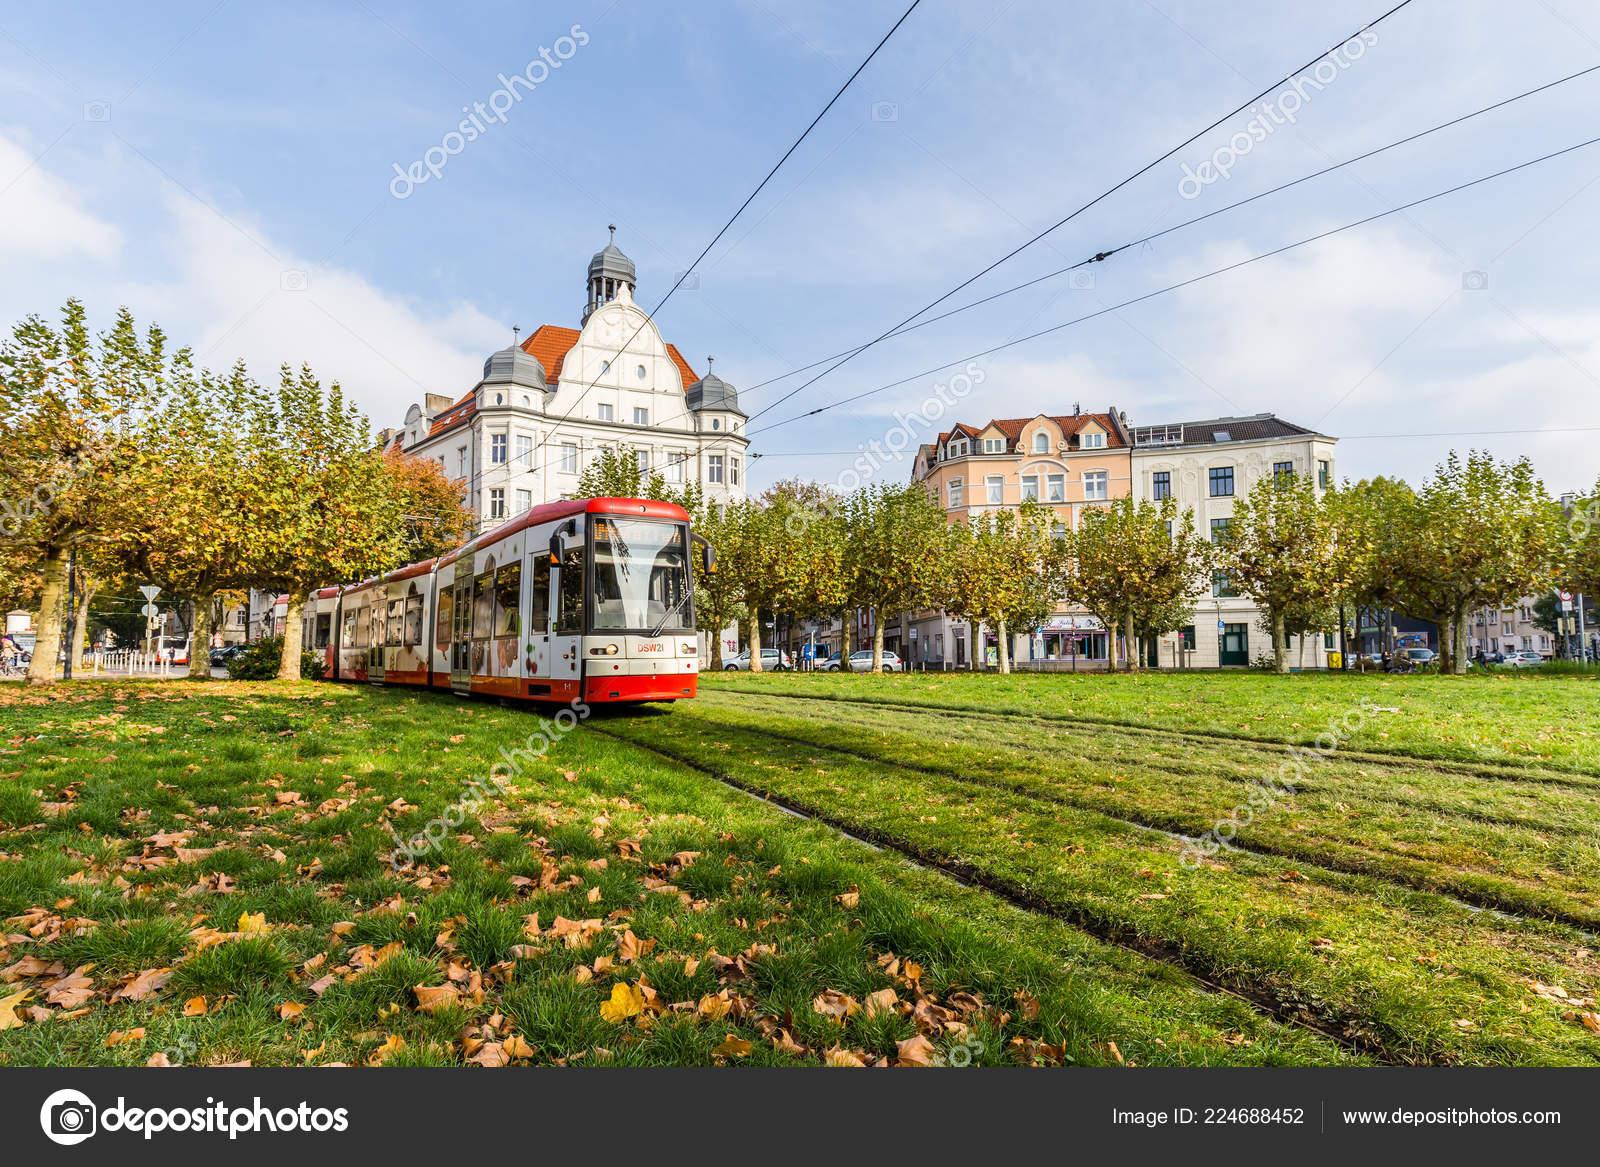 Borsigplatz In Dortmund Germany Stock Editorial Photo C Photoweges 224688452